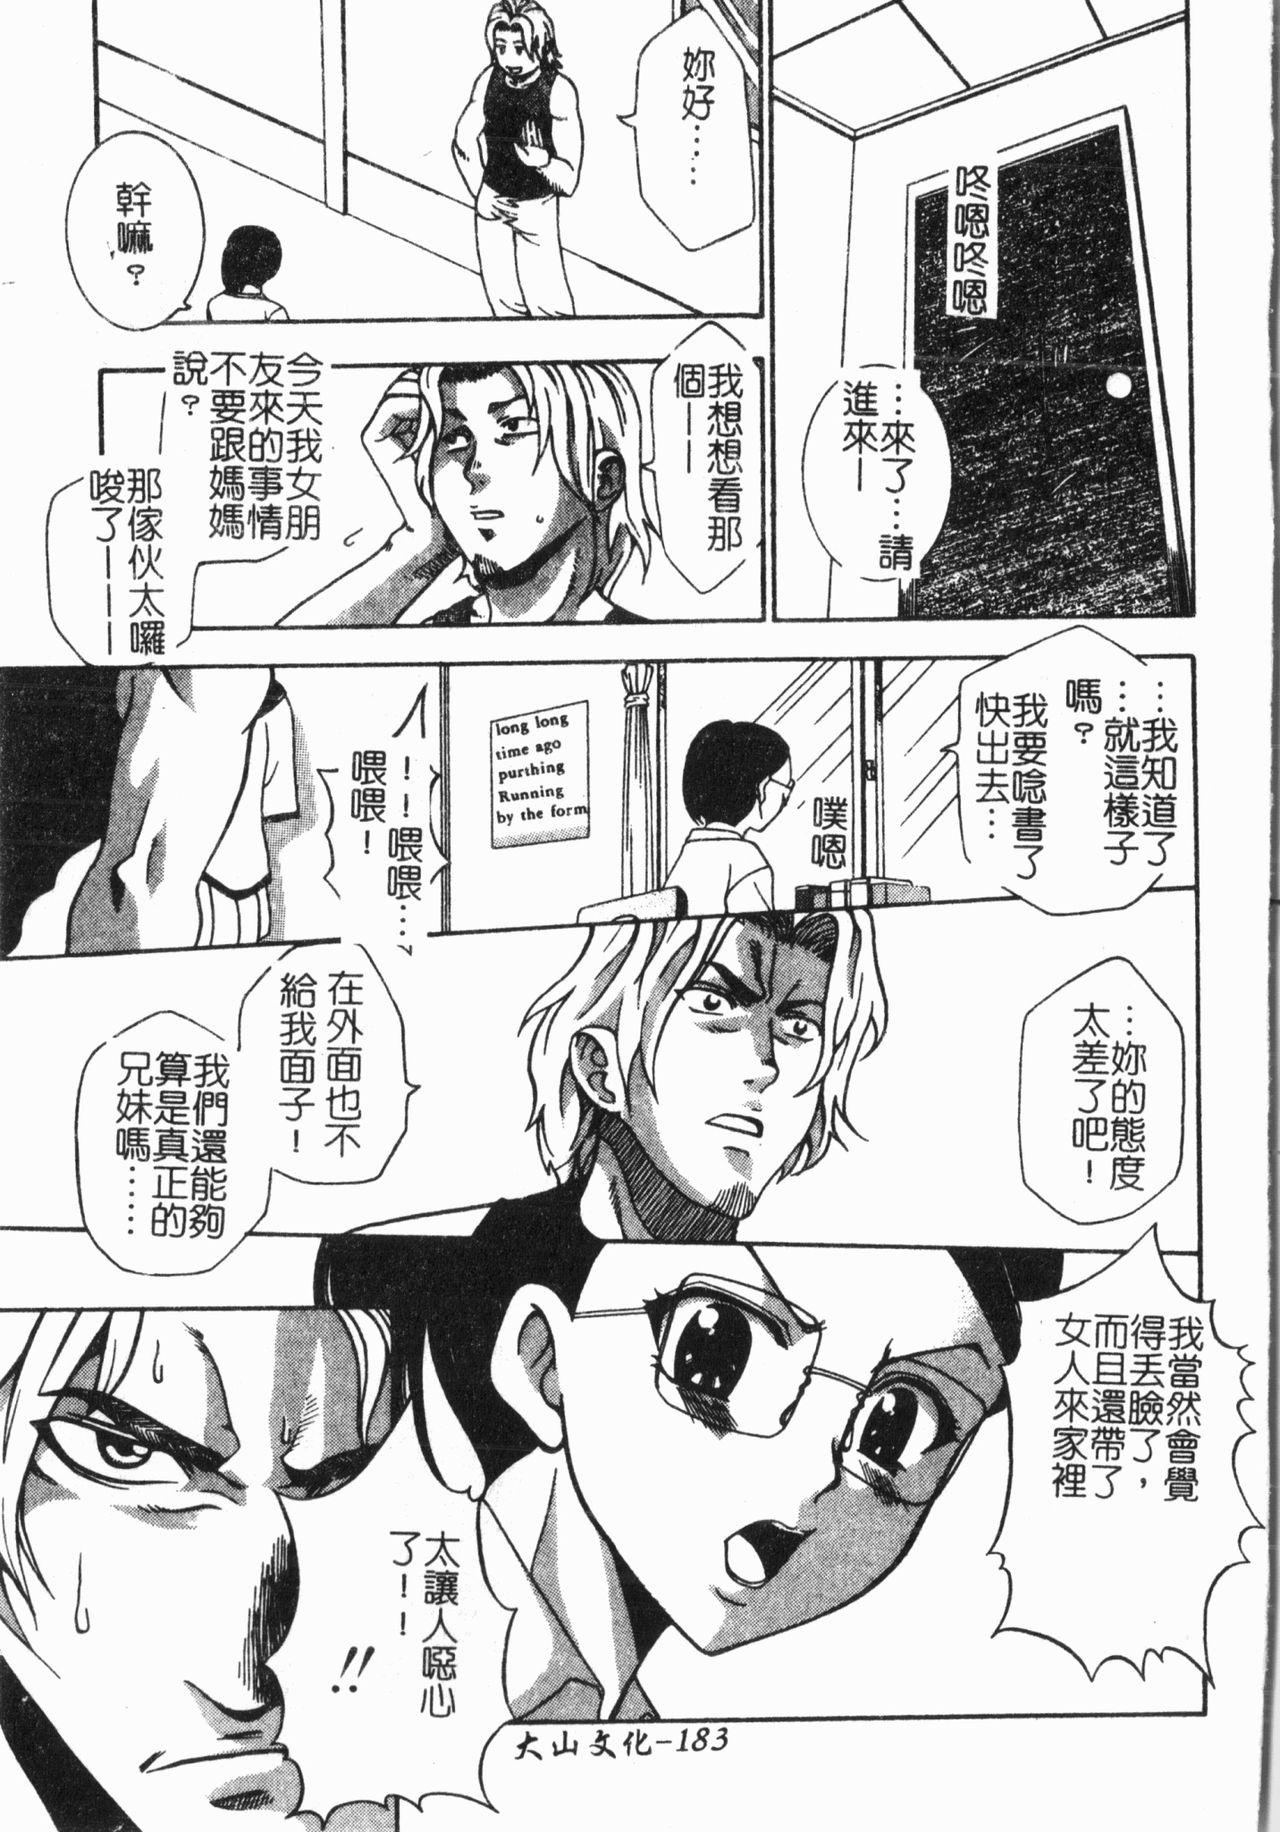 Imouto Koishi 6 185